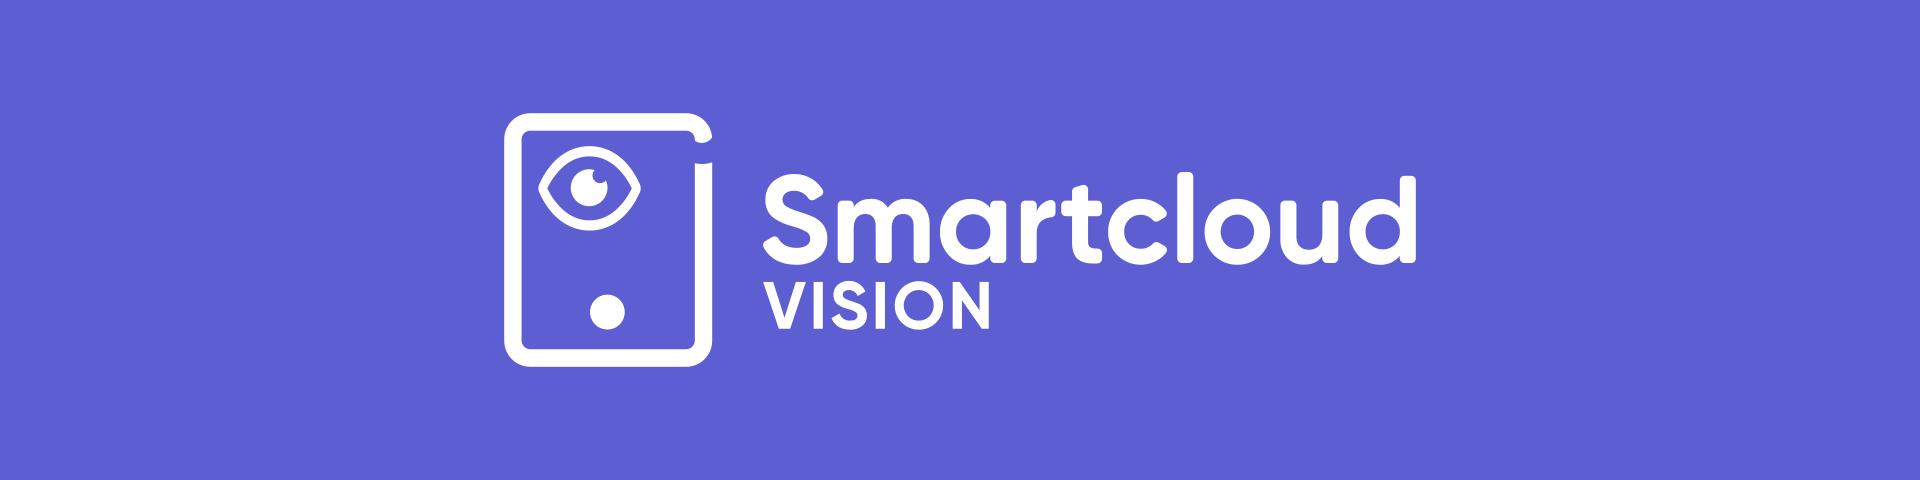 post smarcloud vision 1